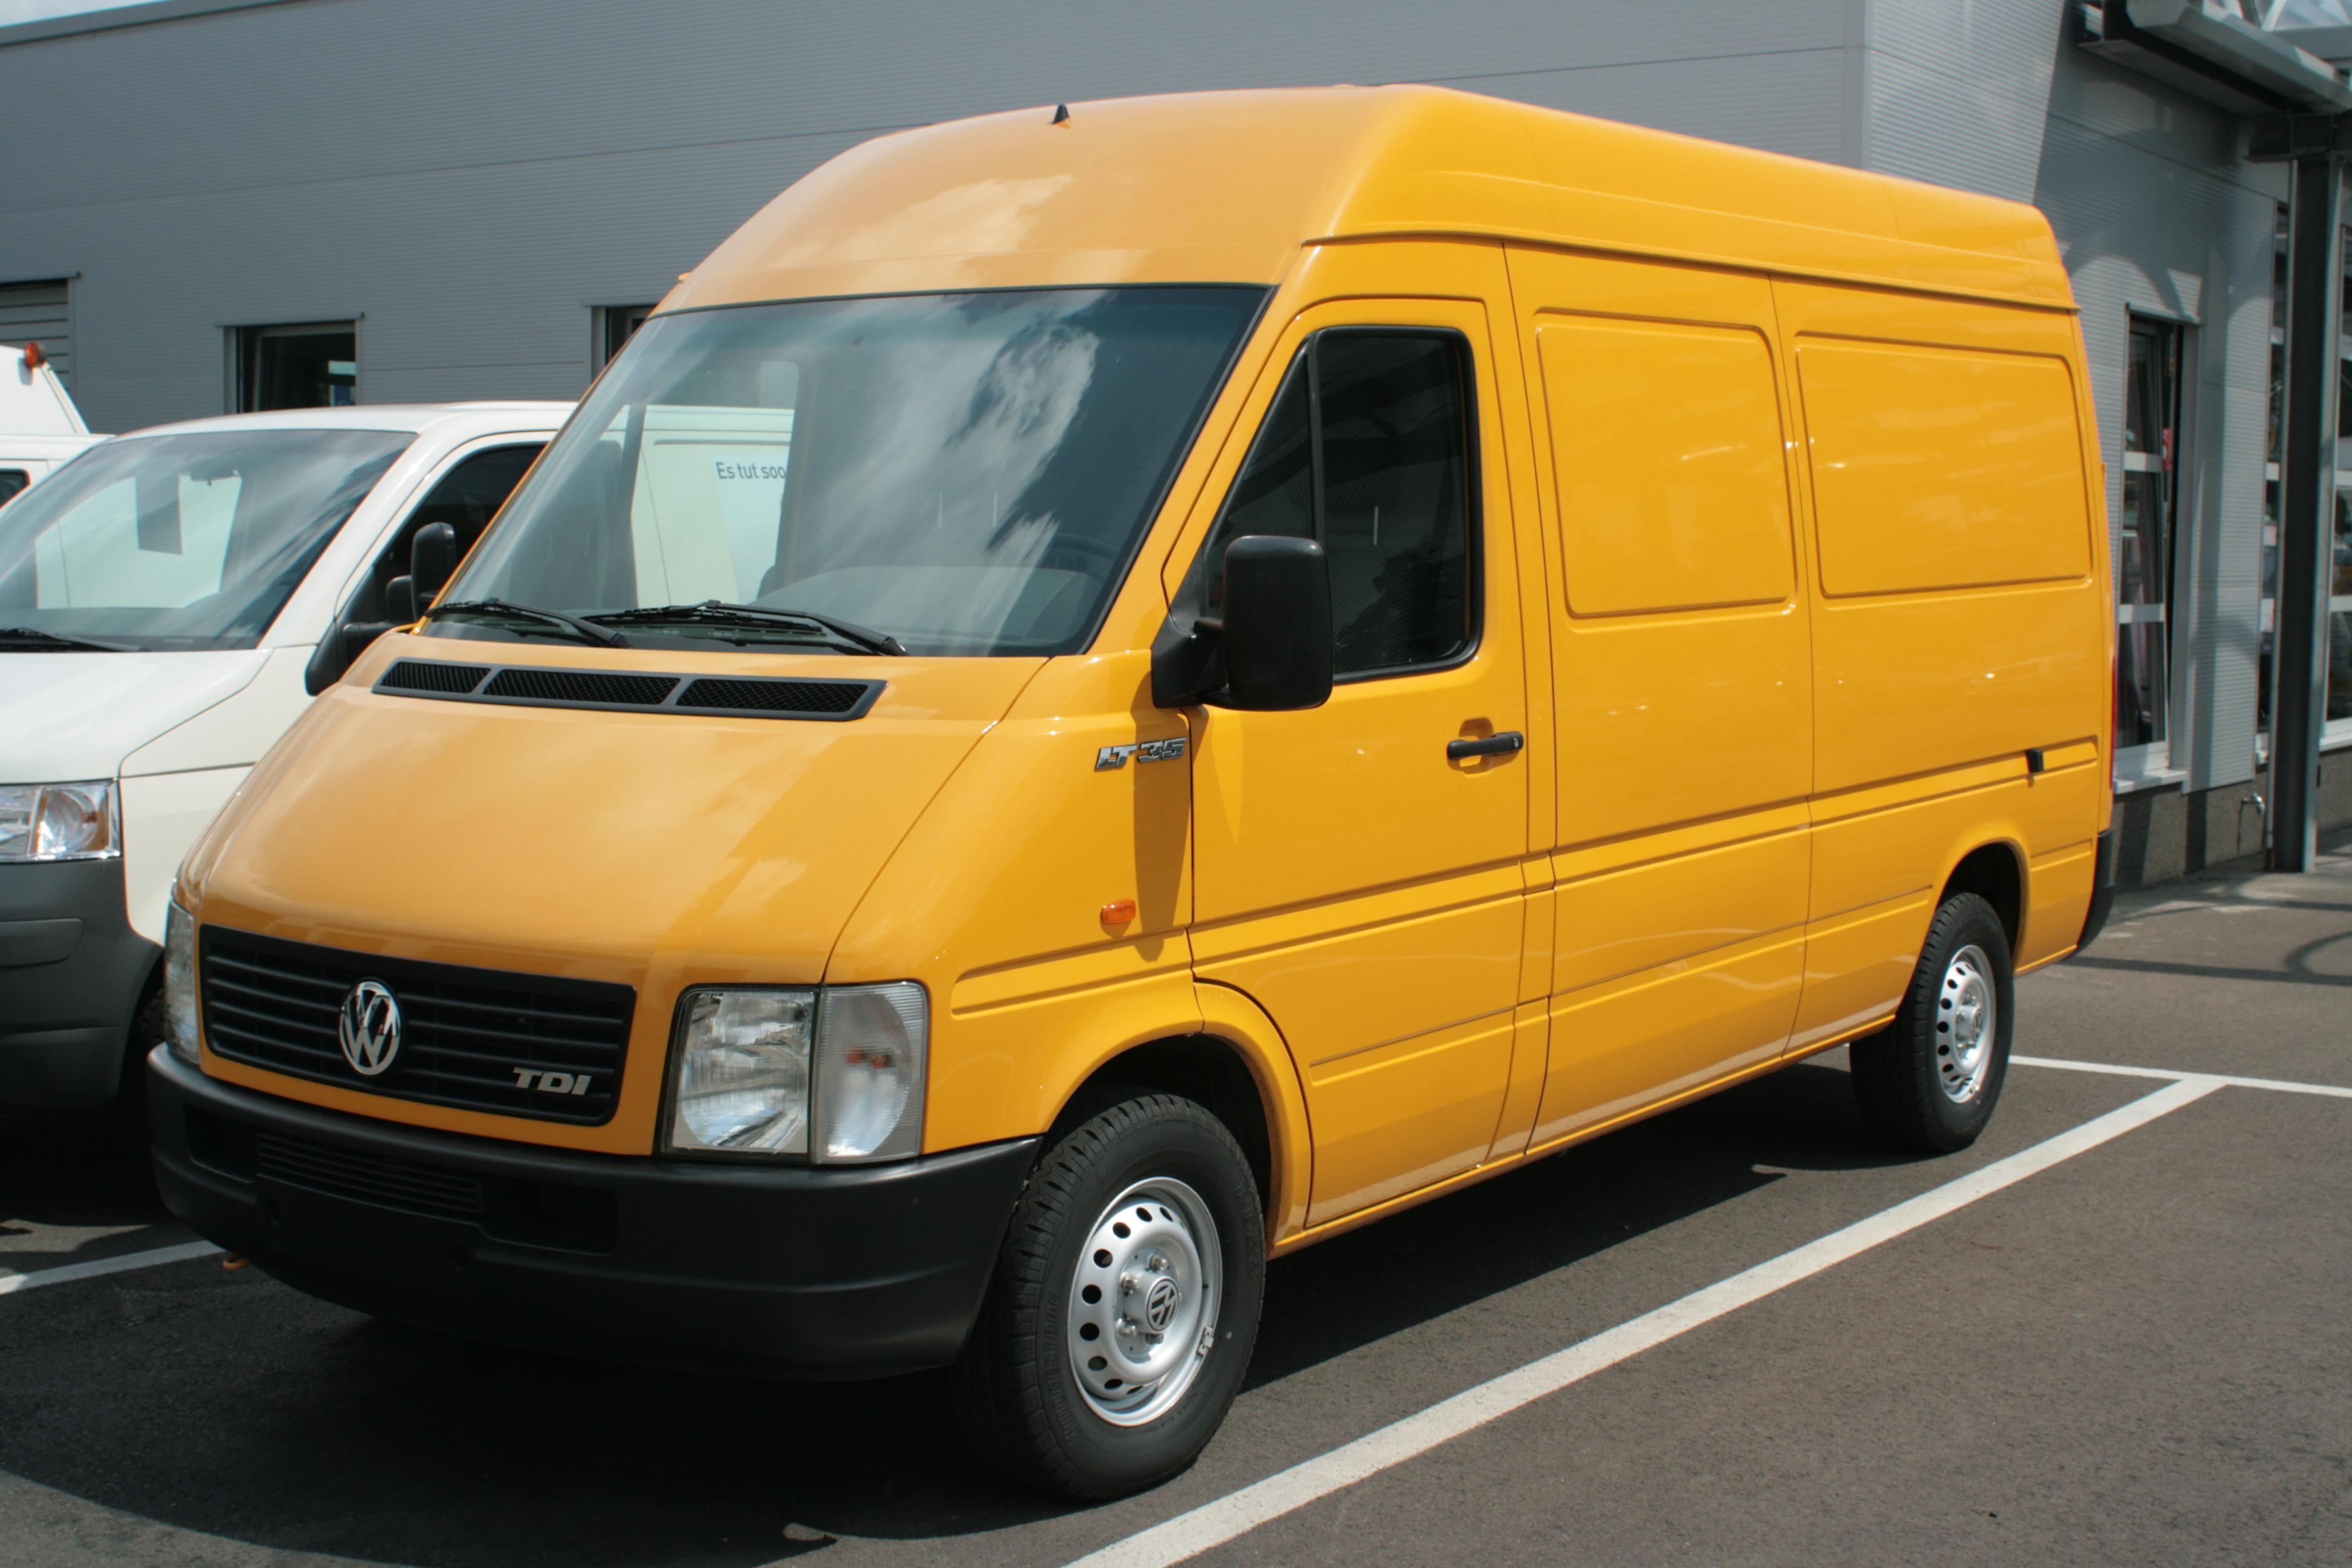 Vw Bus Dimensions >> File:LT35 Kasten gelb.JPG - Wikimedia Commons